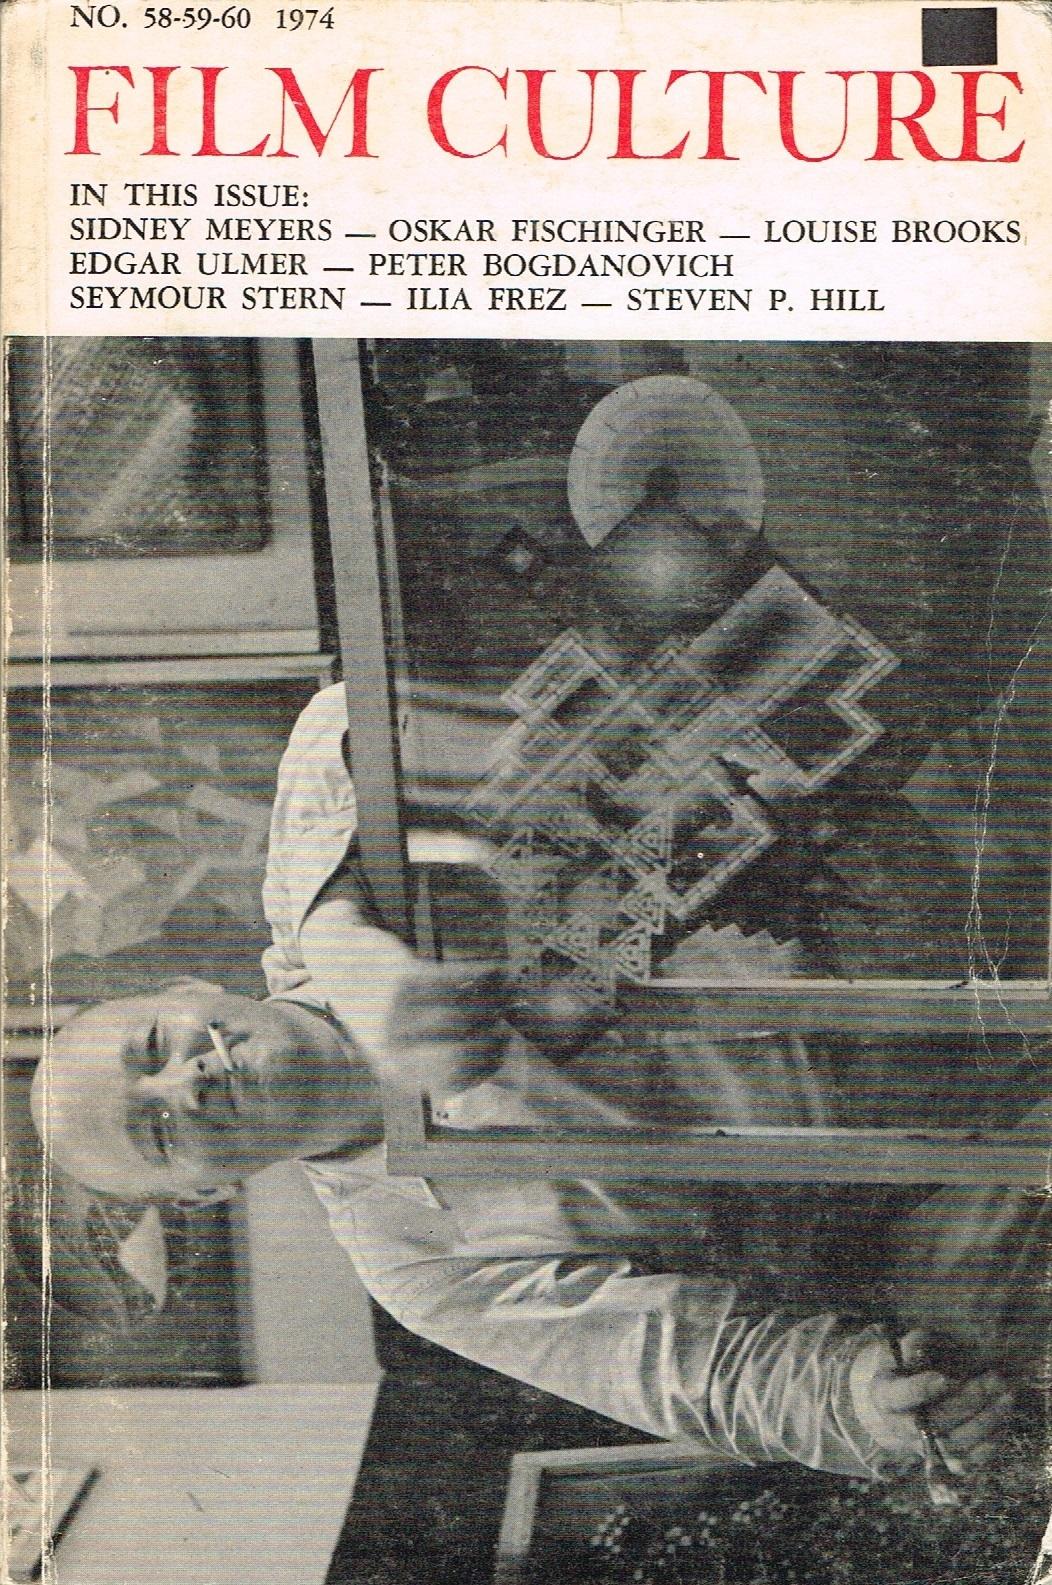 (FILM CULTURE) (FISCHINGER, OSKAR). MEKAS, JONAS, P. ADAMS SITNEY, CAROLINE S. ANGELL & AMY TAUBIN, EDITORS - FILM CULTURE NUMBER 58-59-60 - 1974